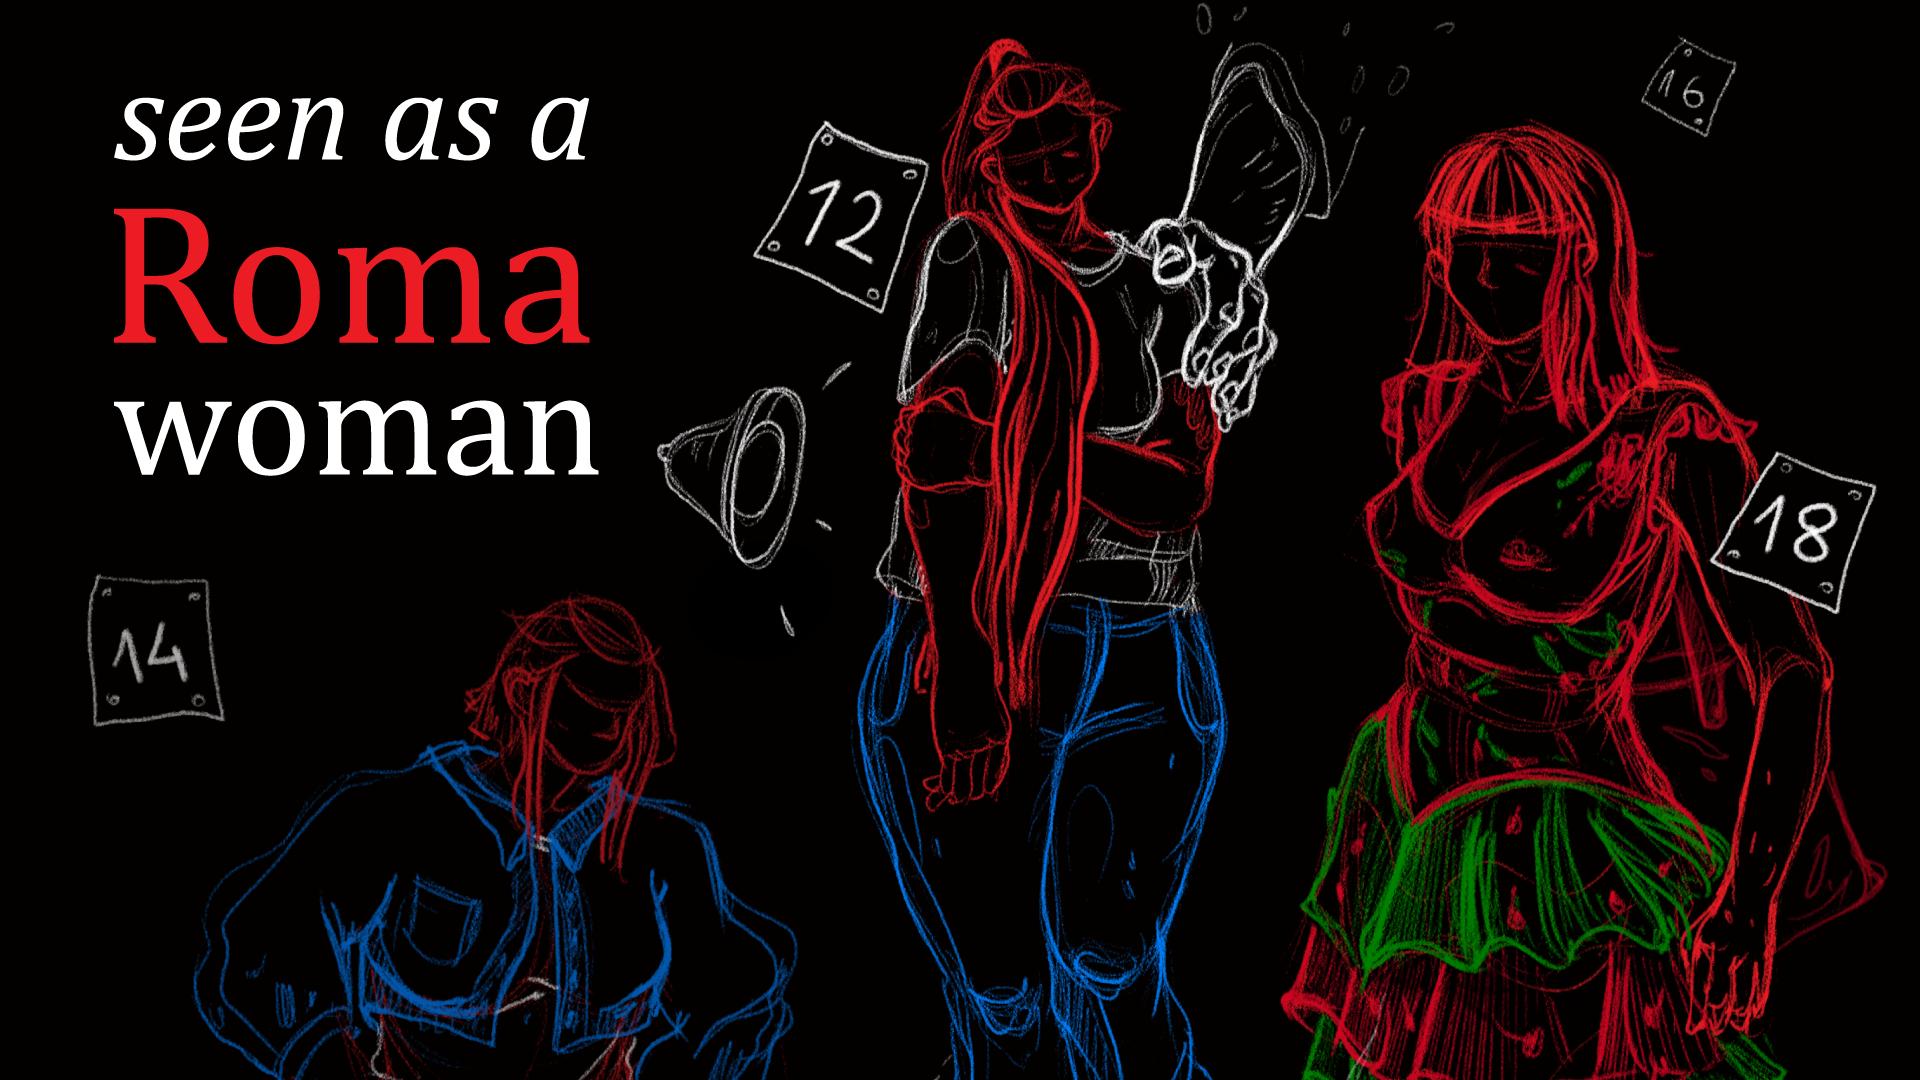 Seen-as-a-Roma-woman